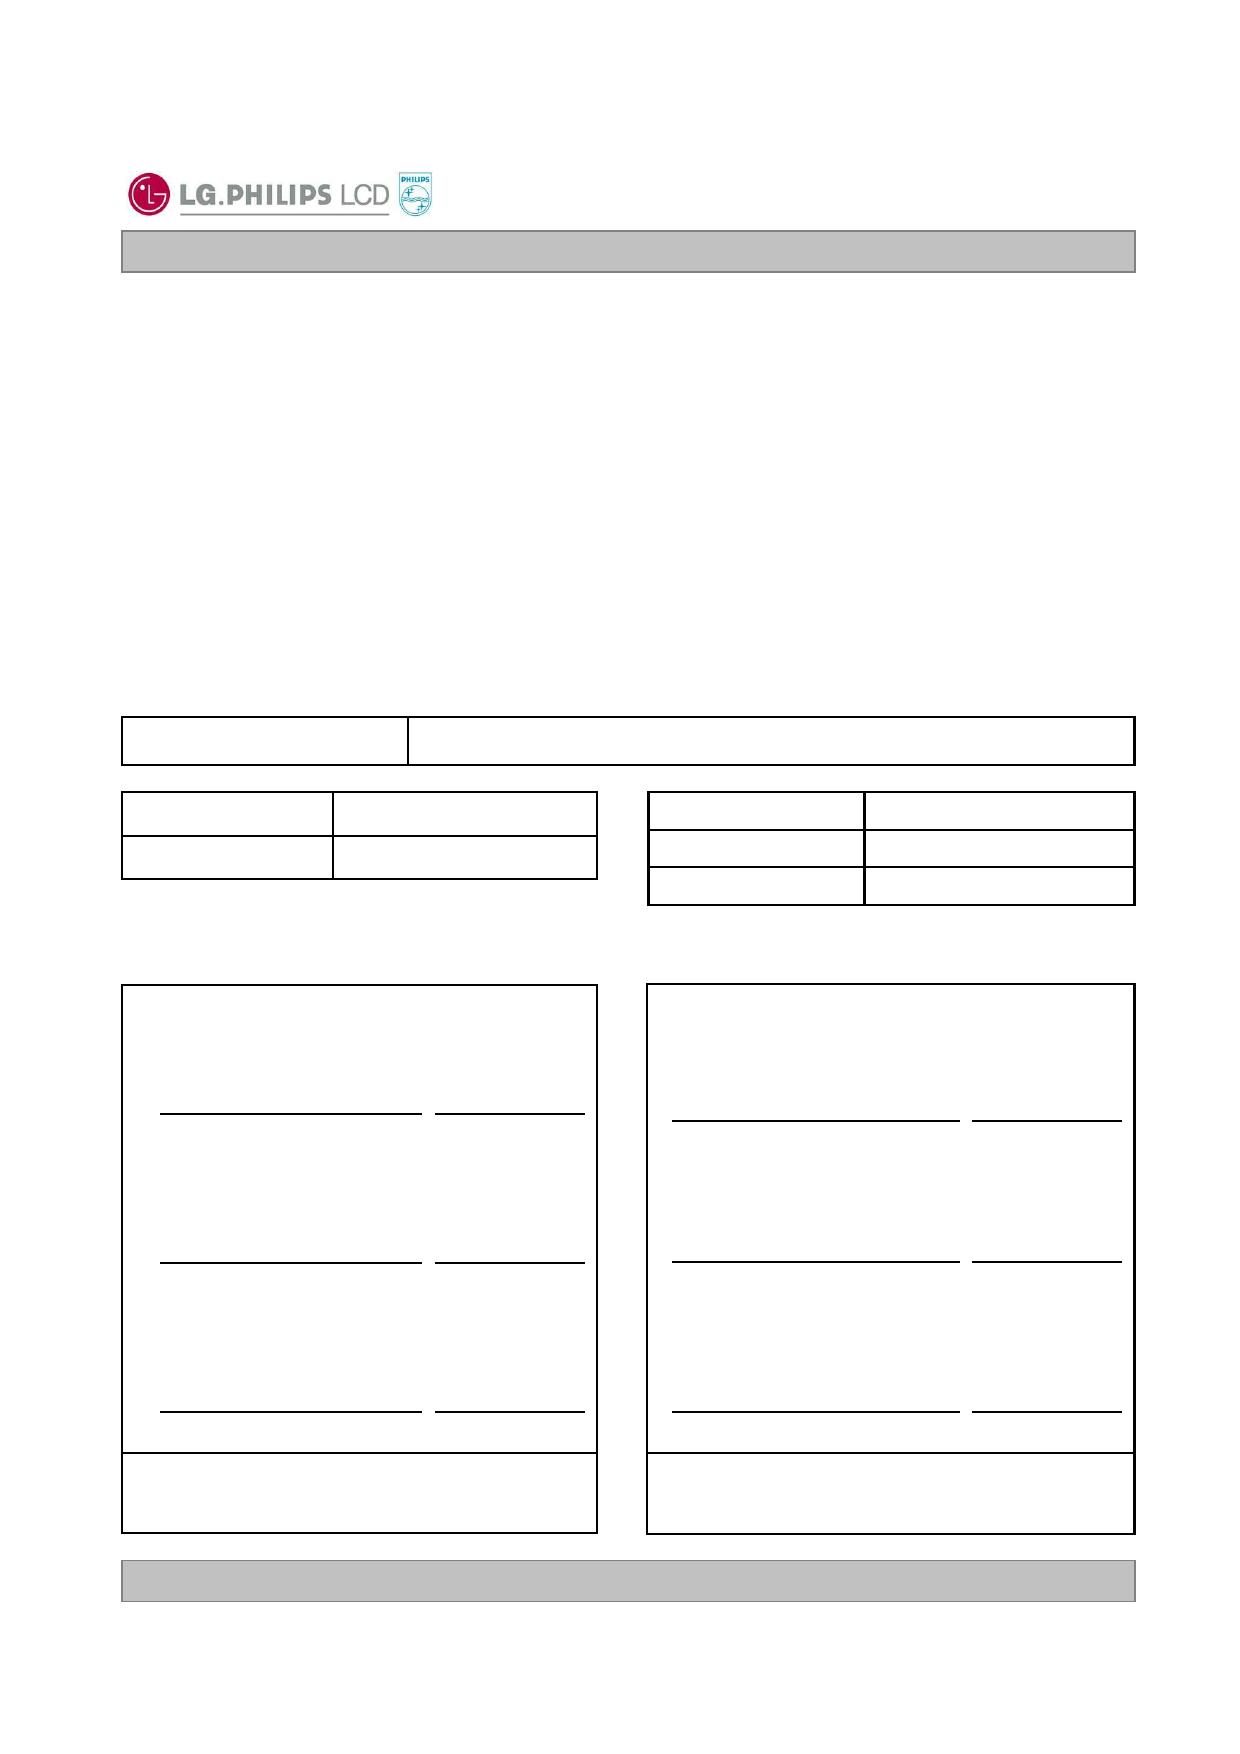 LC320WUN-SAA1 datasheet